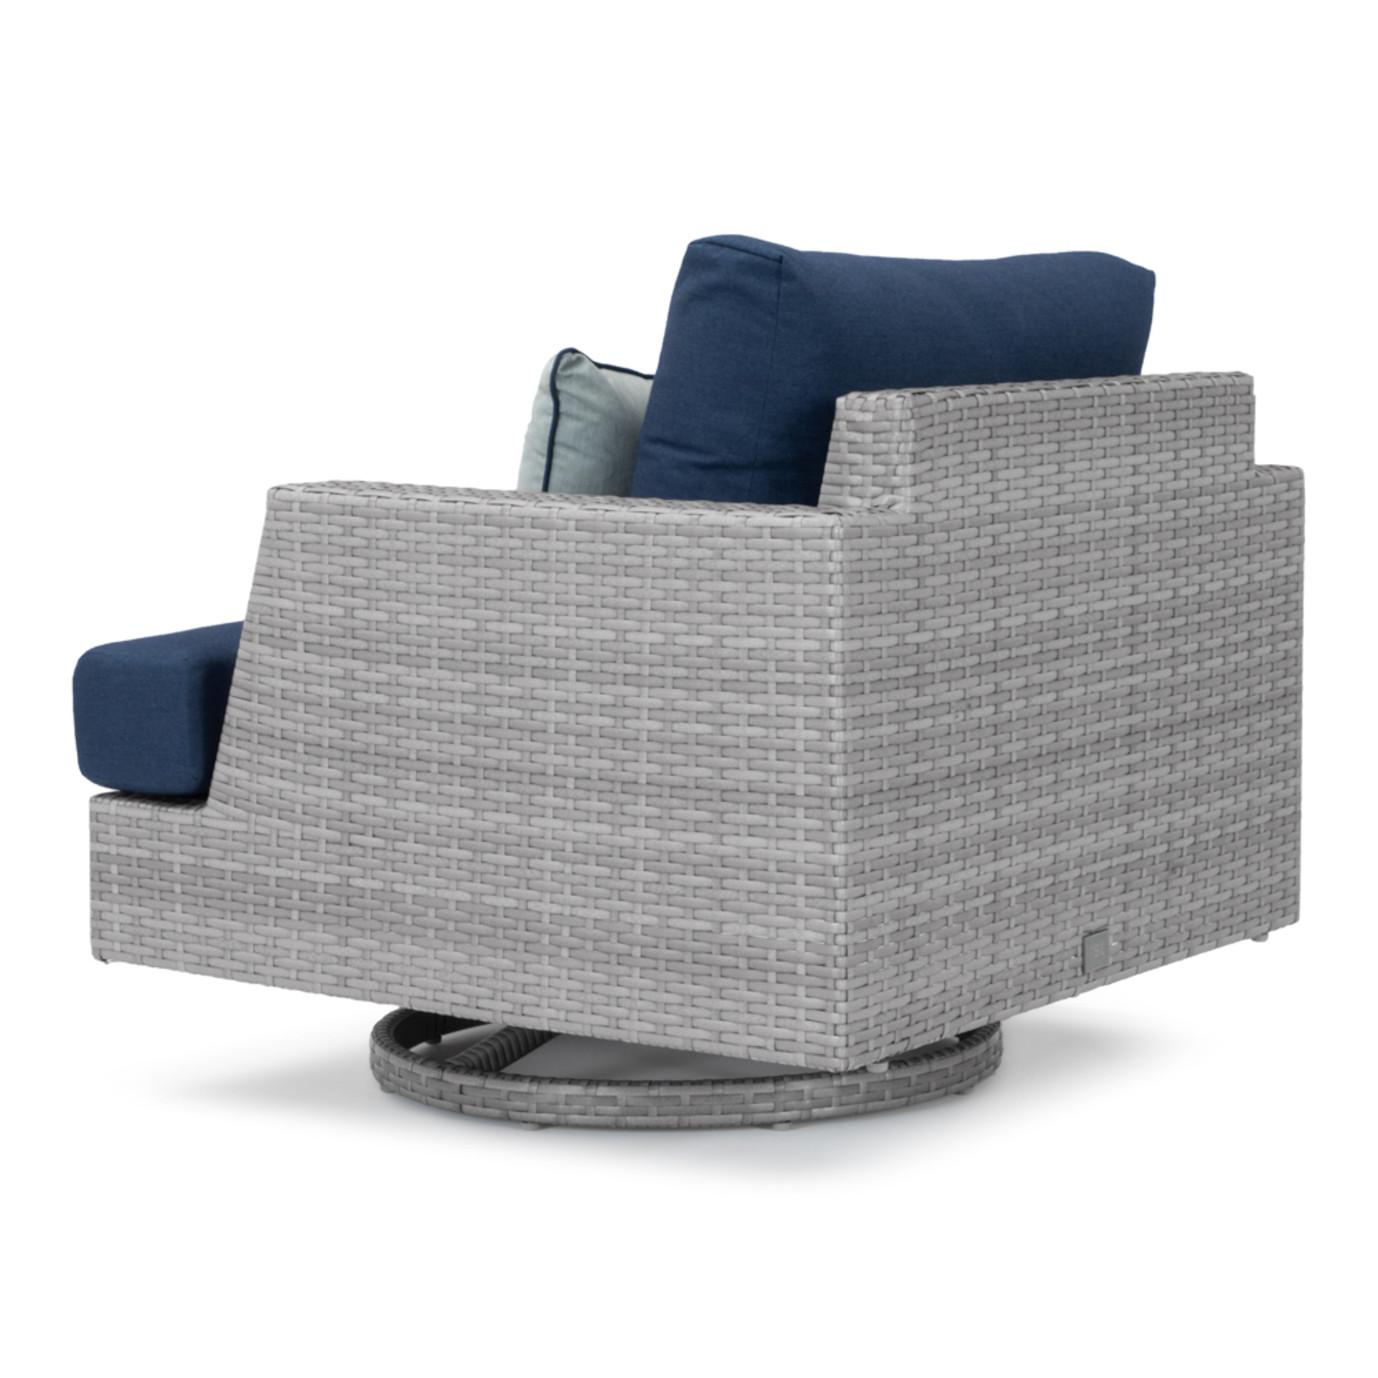 Portofino® Comfort 7 Piece Motion Wood Seating Set - Laguna Blue